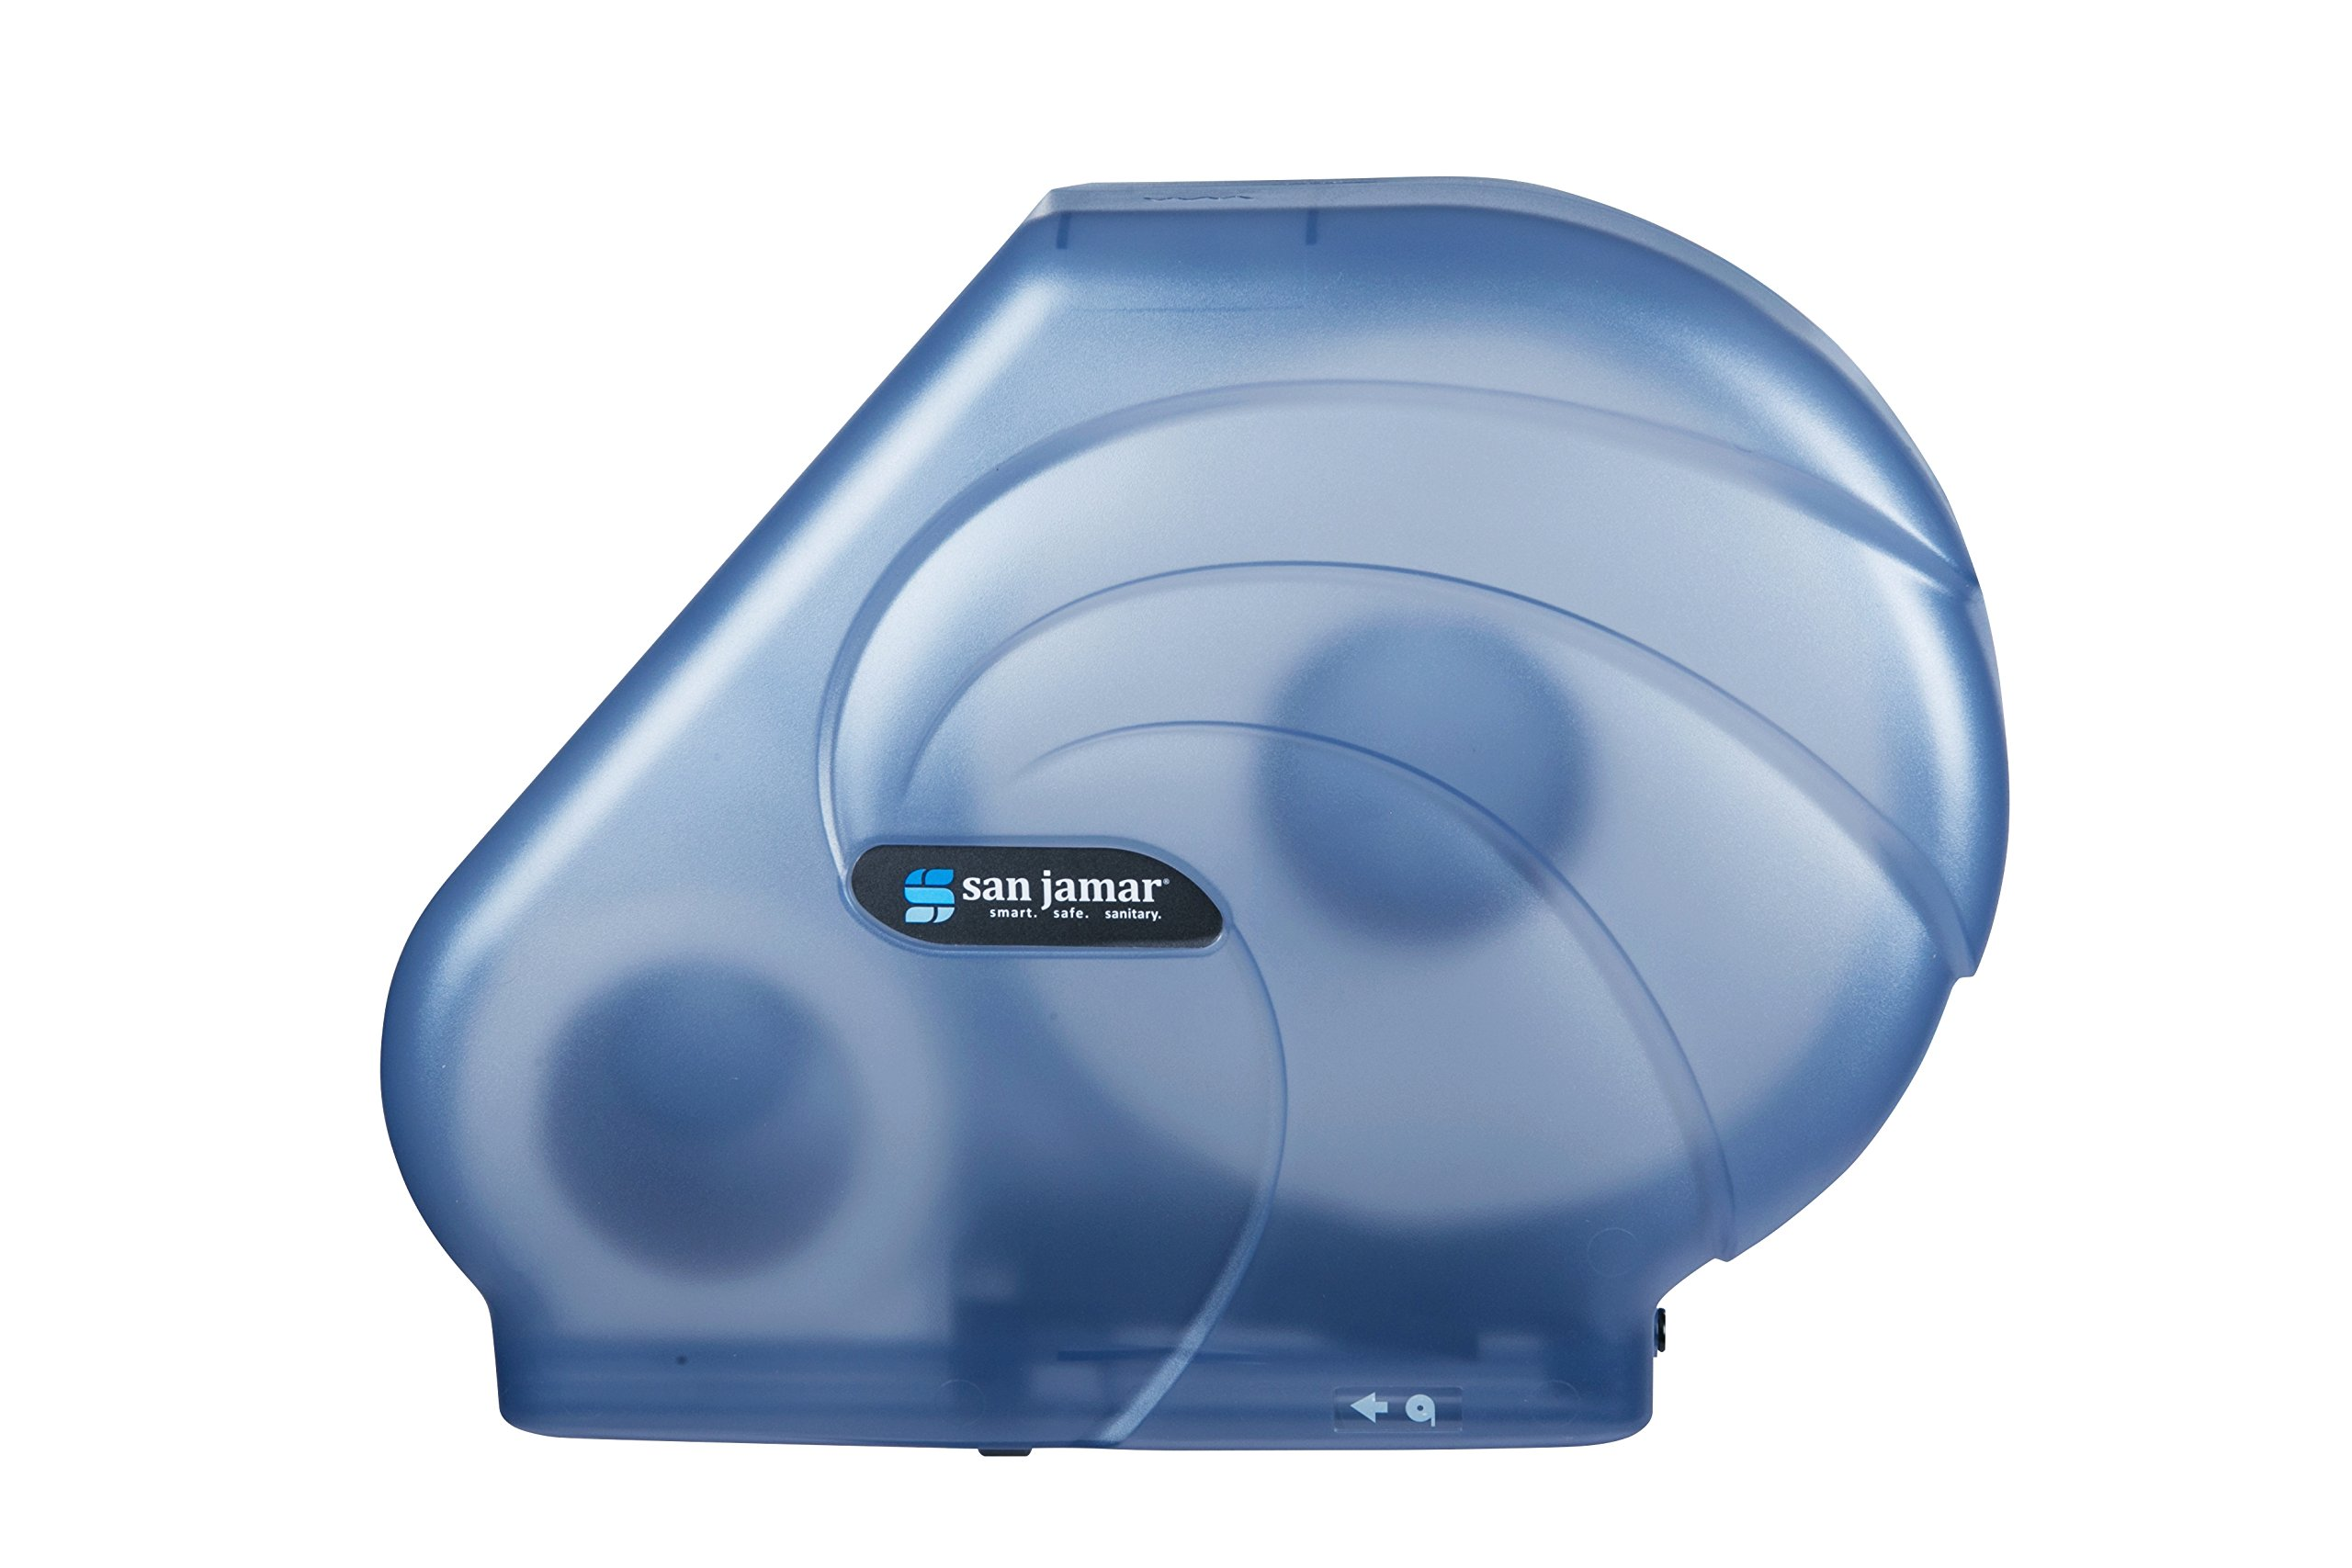 San Jamar R3090 Oceans Reserva 9'' - 10-1/2'' Jumbo Bath Tissue Dispenser, 16-3/4'' Width x 12-1/4'' Height x 5-1/2'' Depth, Arctic Blue